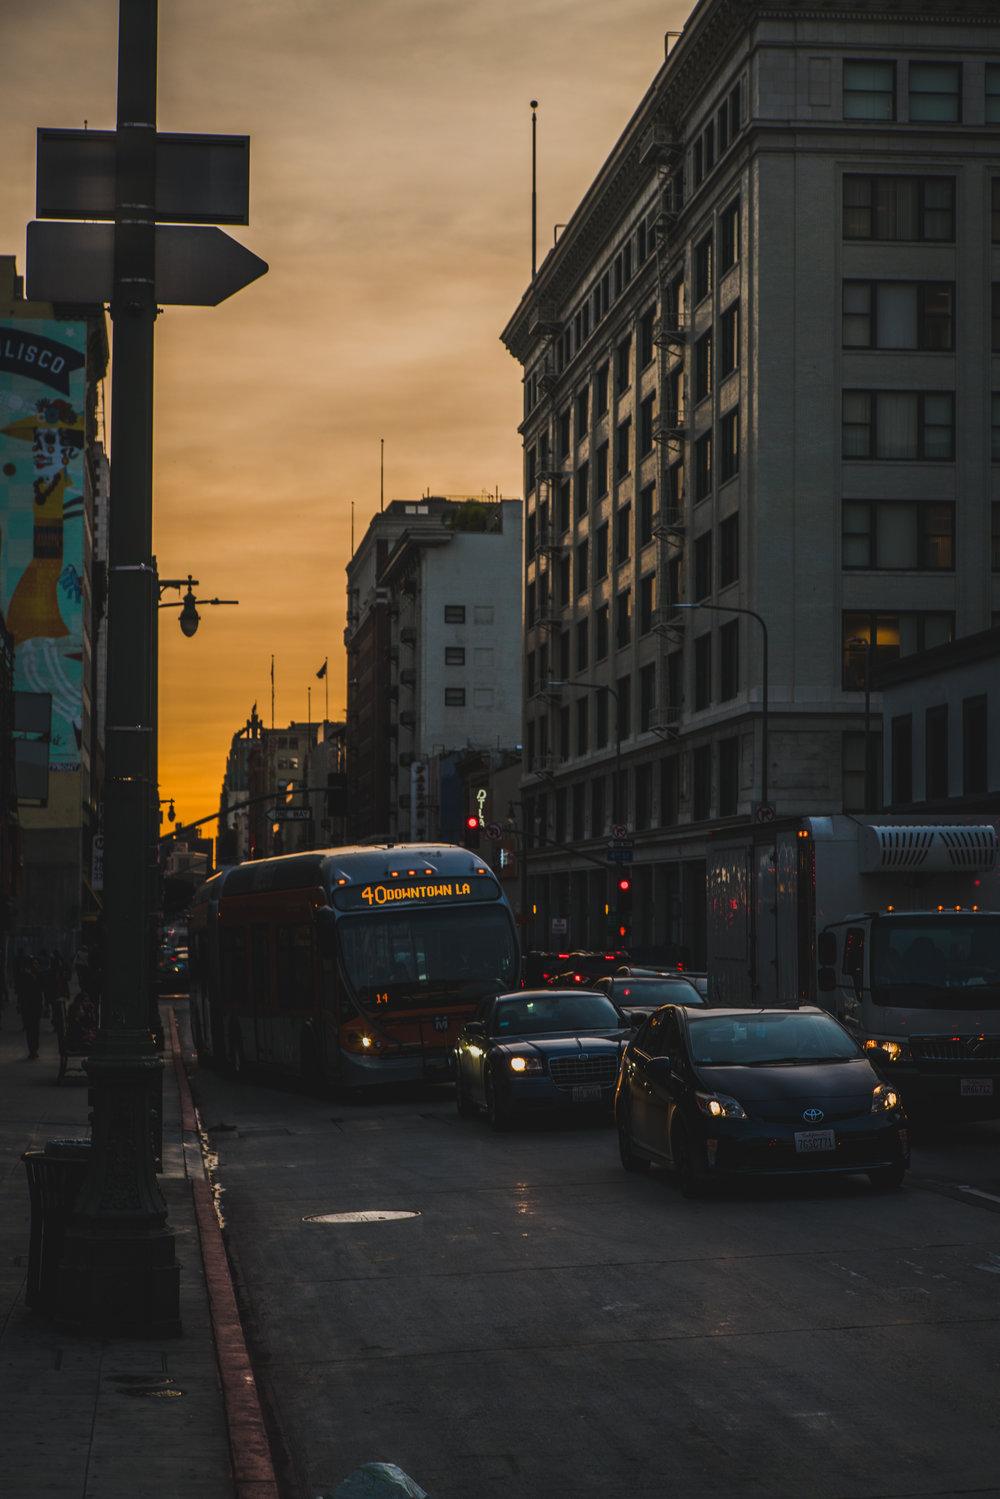 LA haze makes for a beautiful sunset